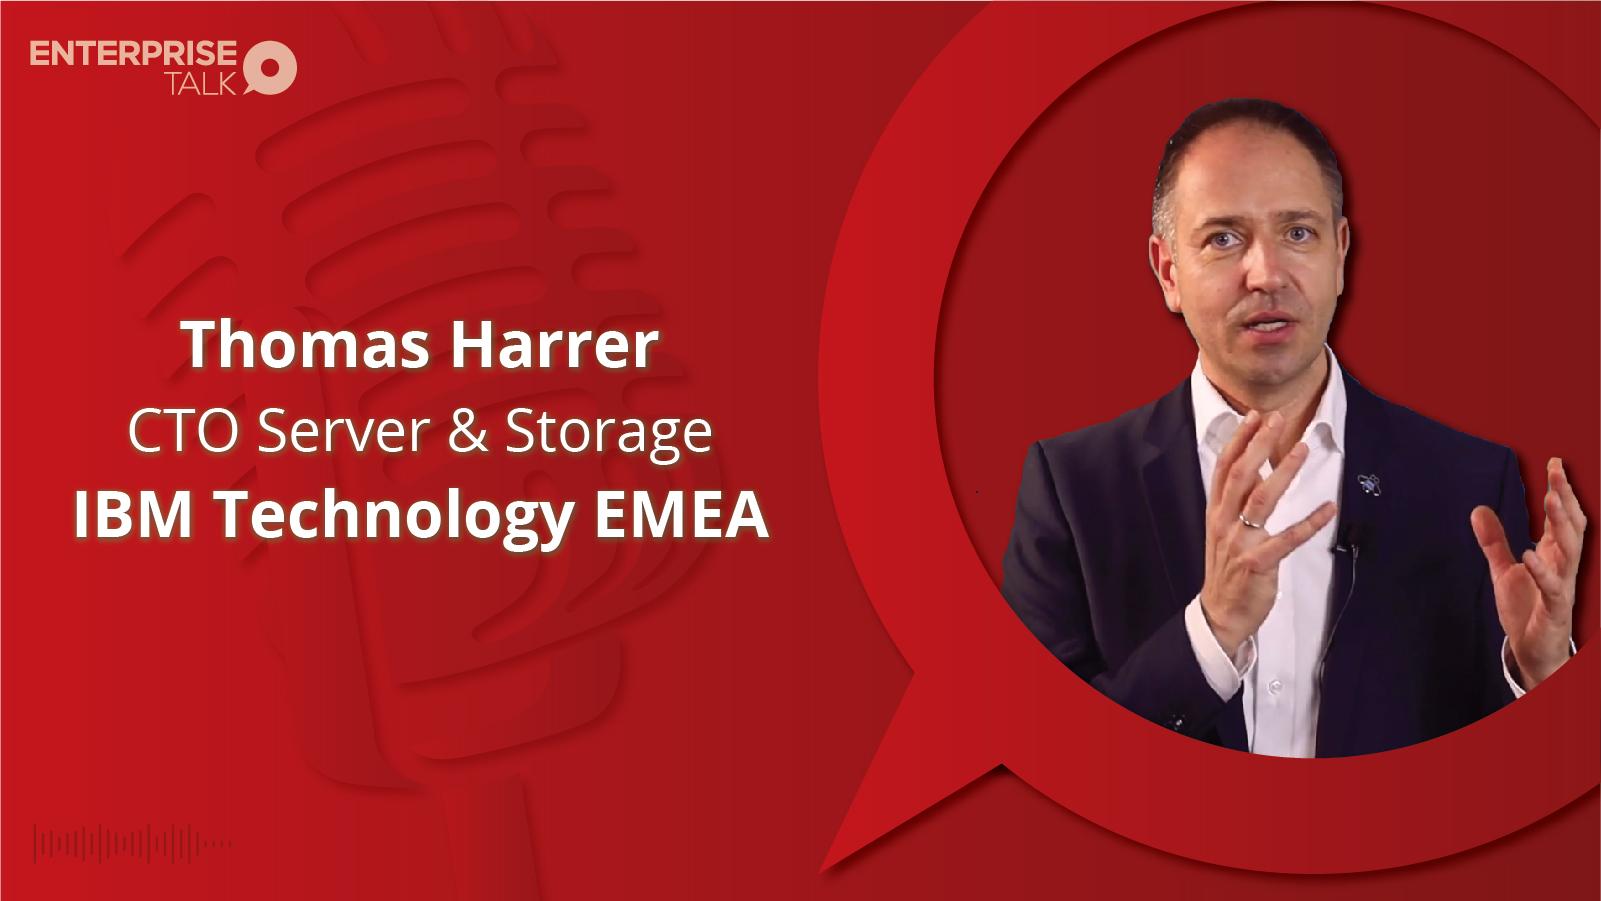 Interview with Thomas Harrer, CTO Server & Storage, IBM Technology EMEA